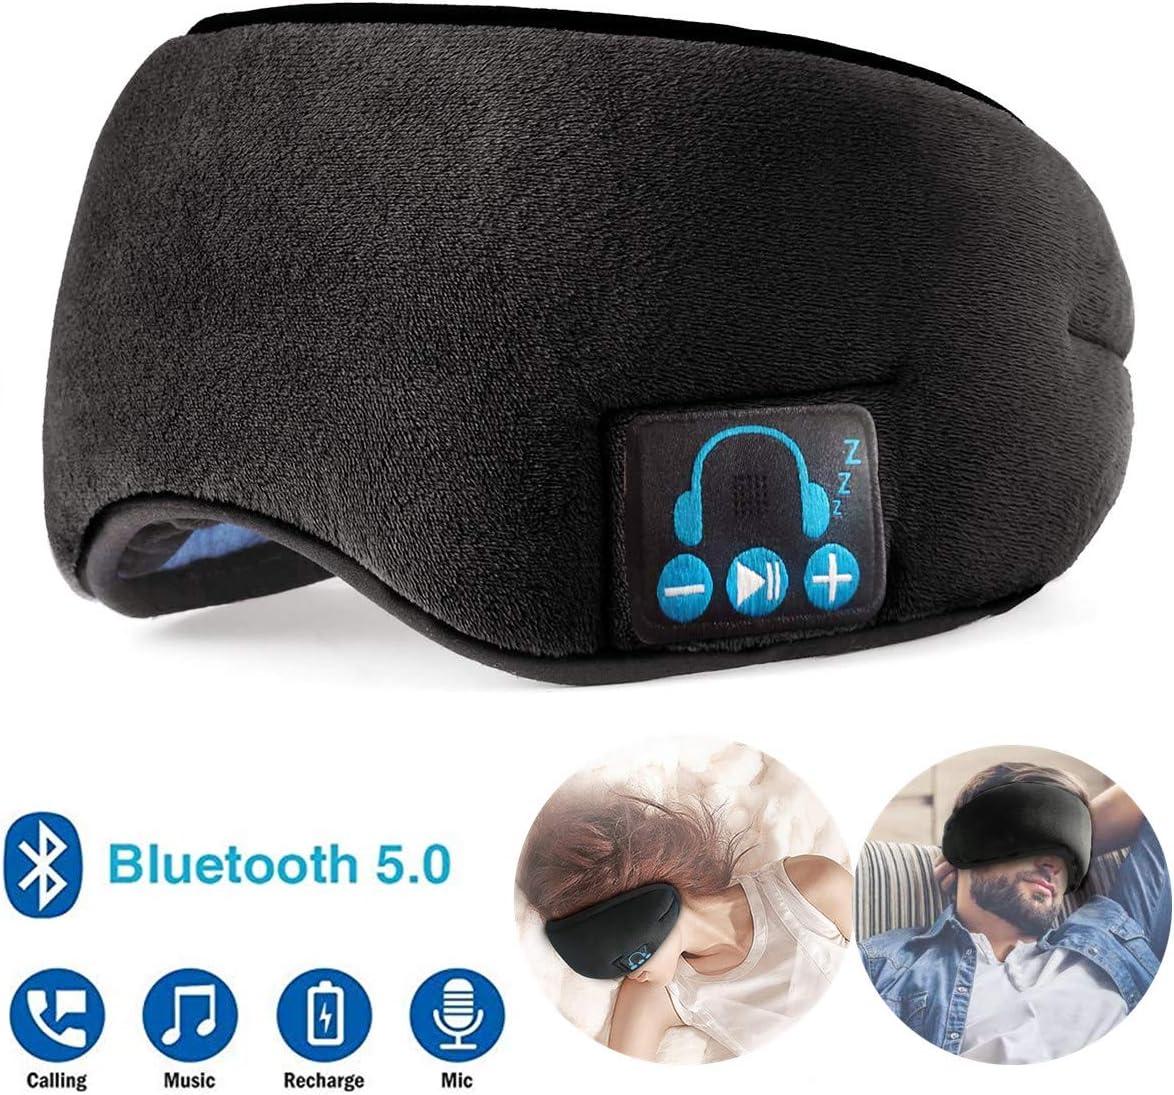 Bluetooth Sleep Headphones, Wireless 5.0 Sleeping Eye Mask Travel Music Headset for Side Sleepers, Built-in Washable Microphone Speakers